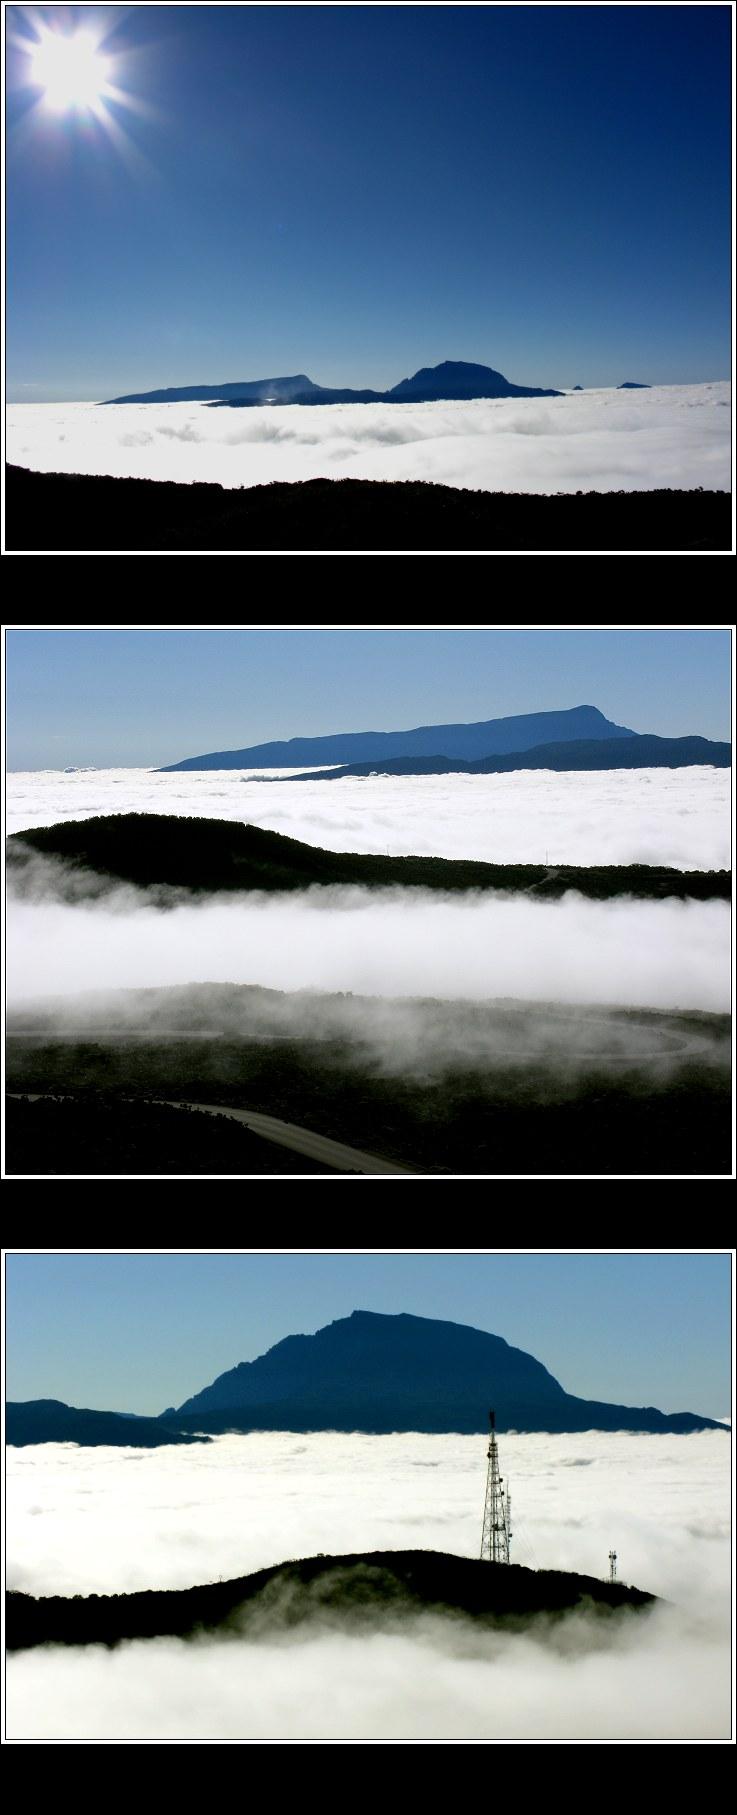 nuages%20blog.jpg